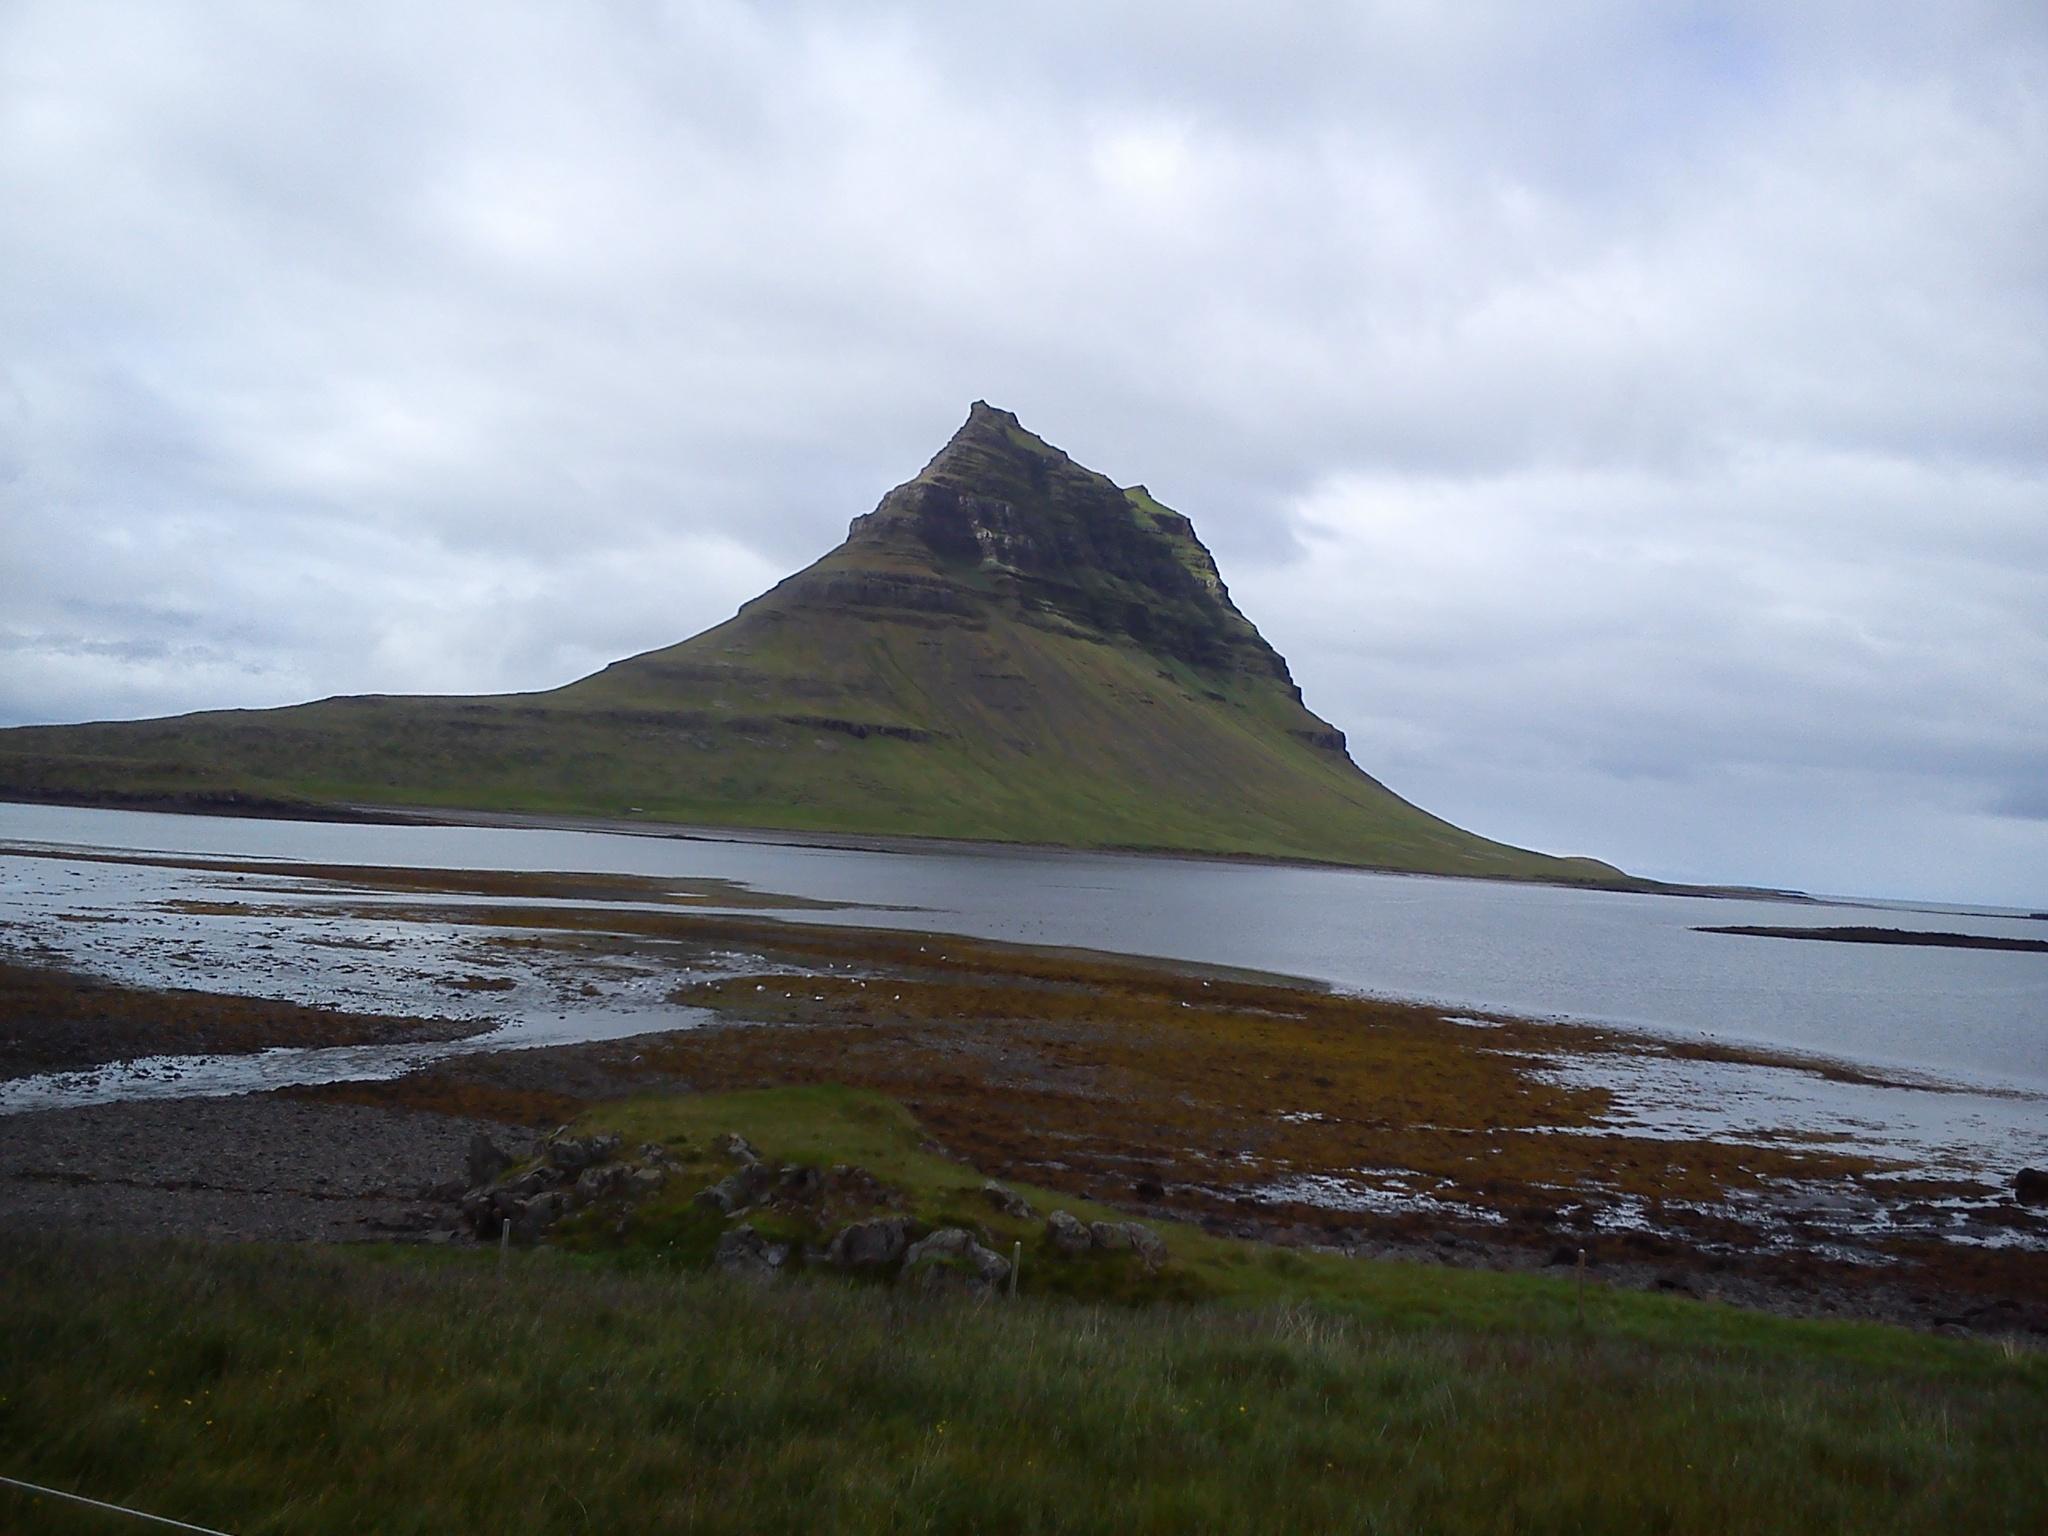 Snaefellsnes Peninsula, Iceland by Gunnerman85